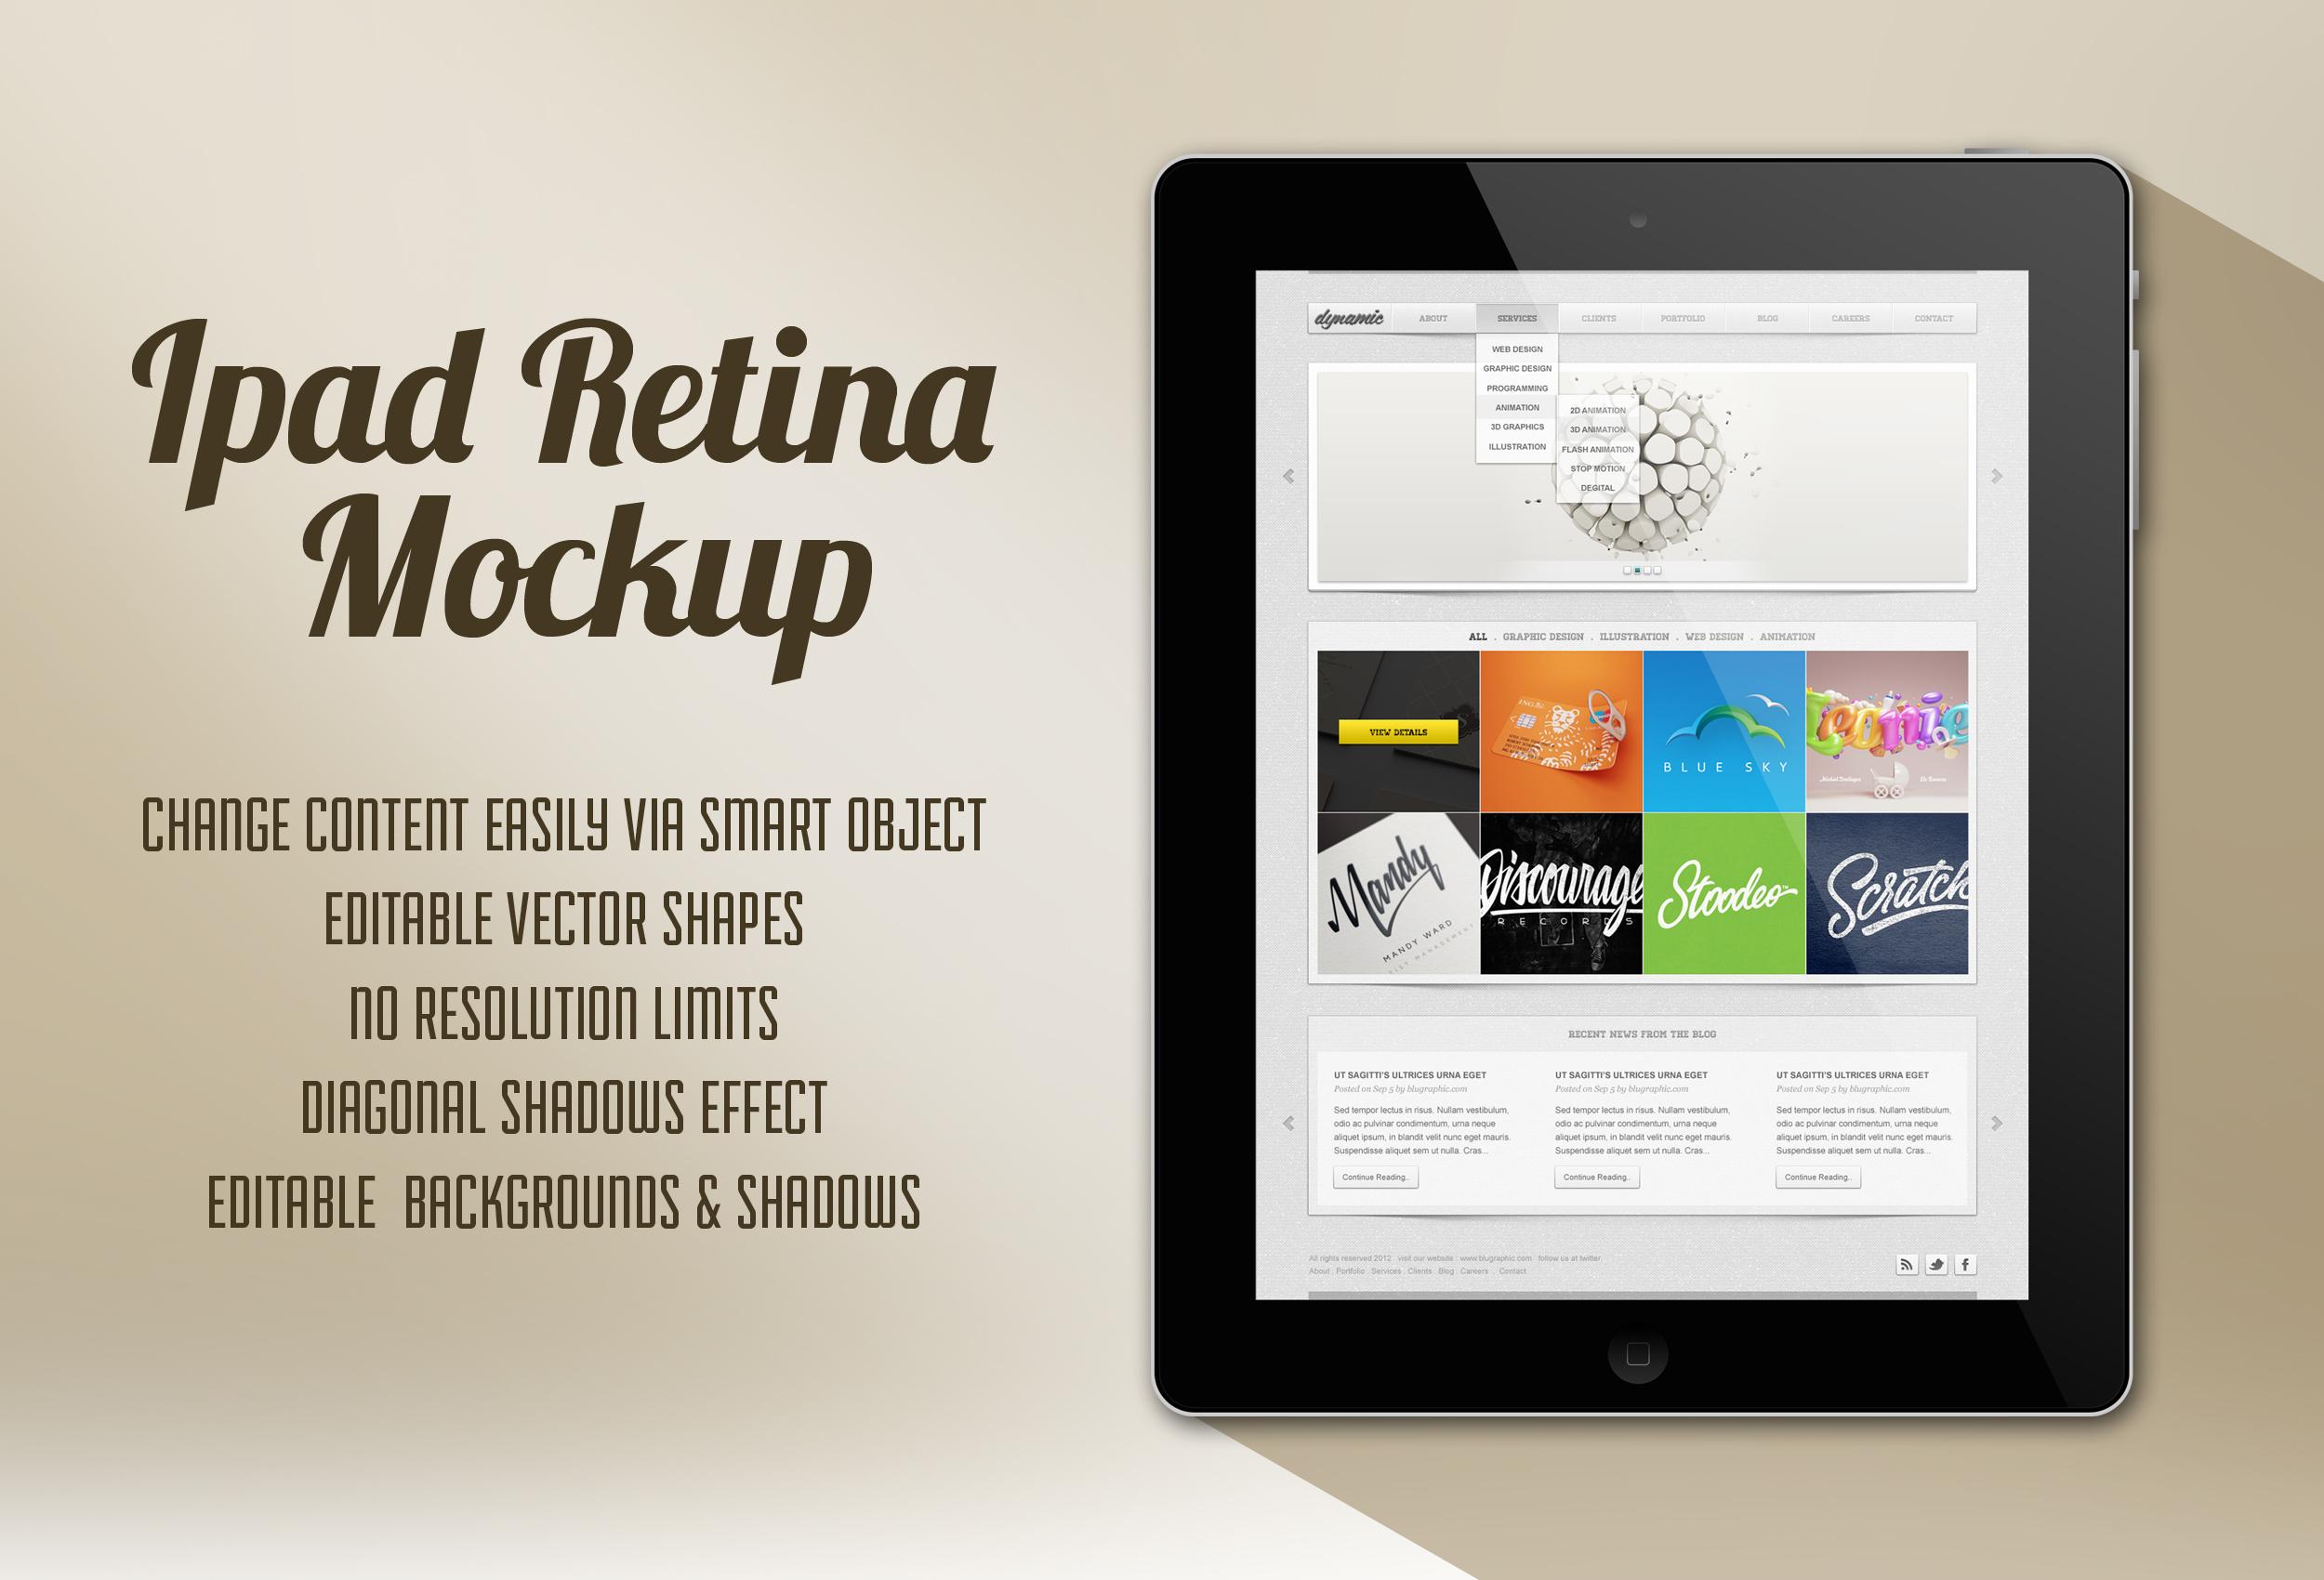 tablet Retina Mockup Psd